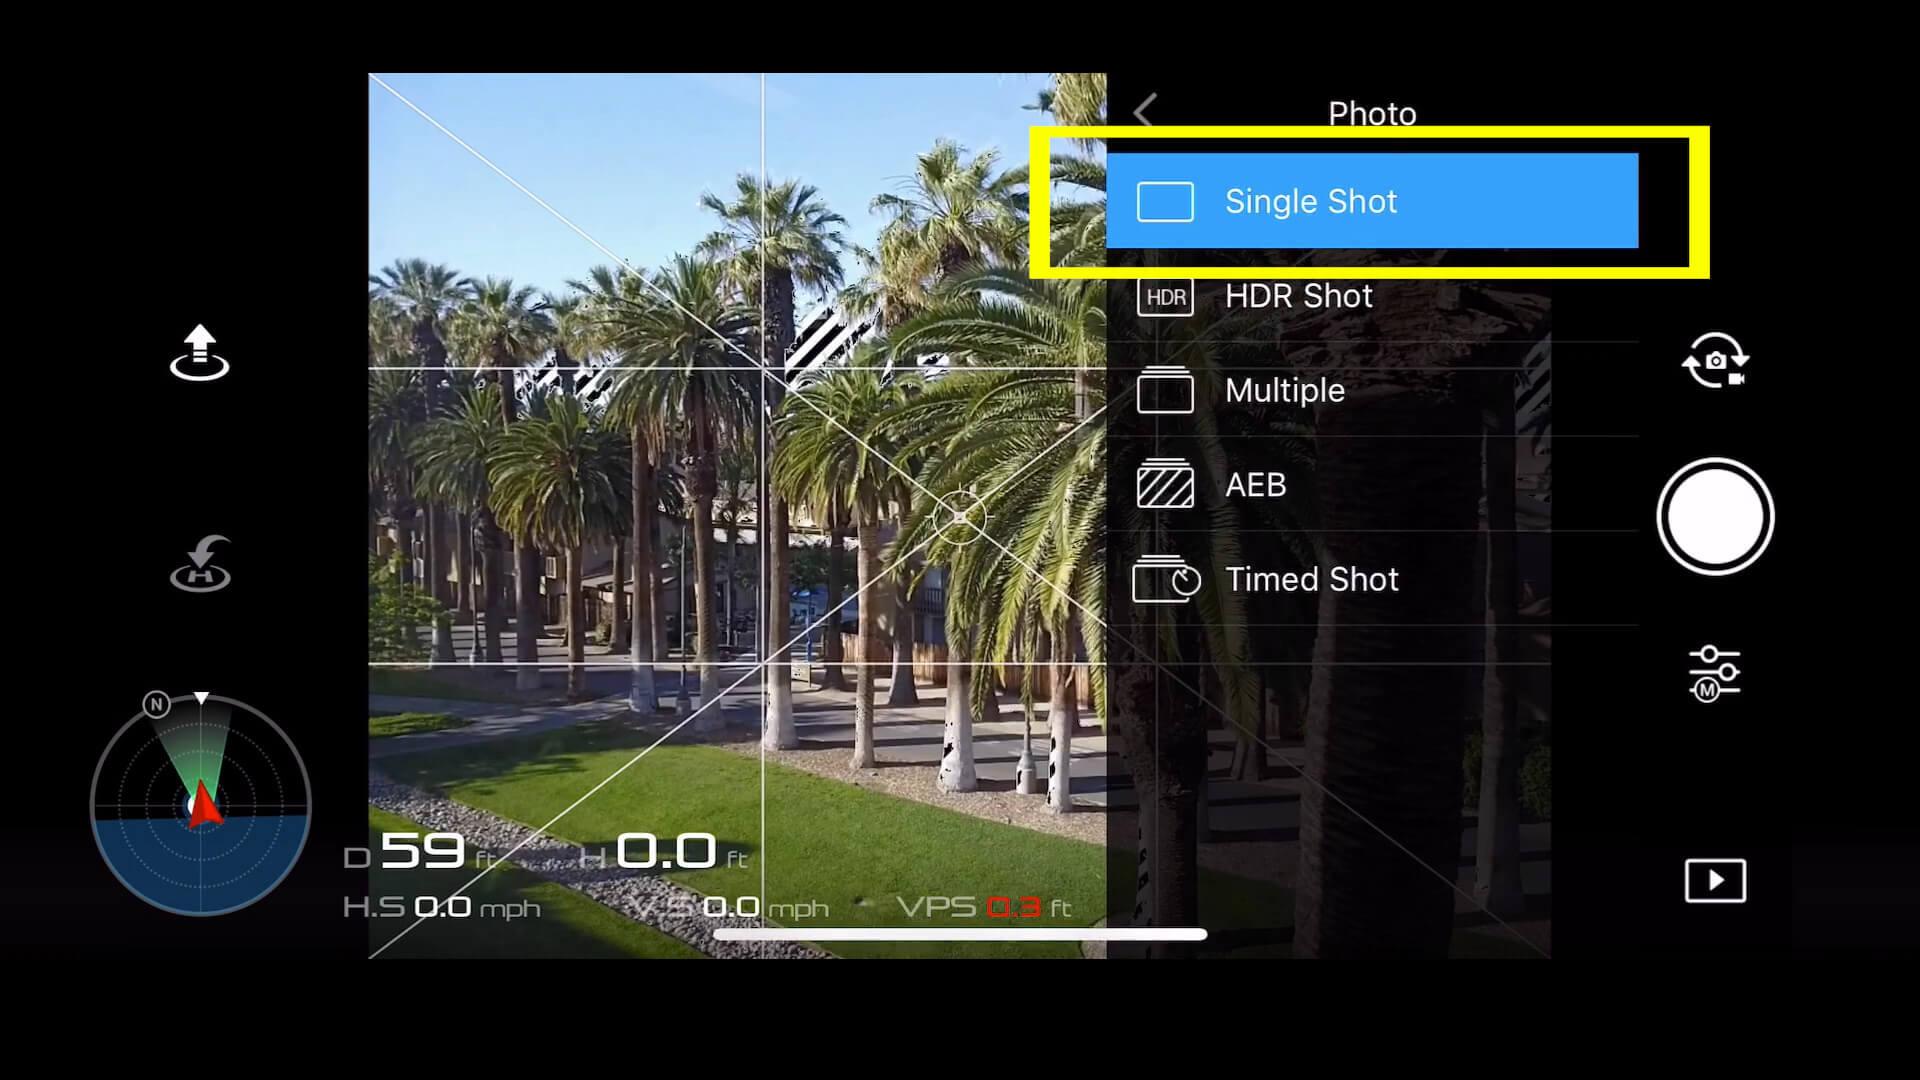 17 basic camera settings for dji drone photos - single shot